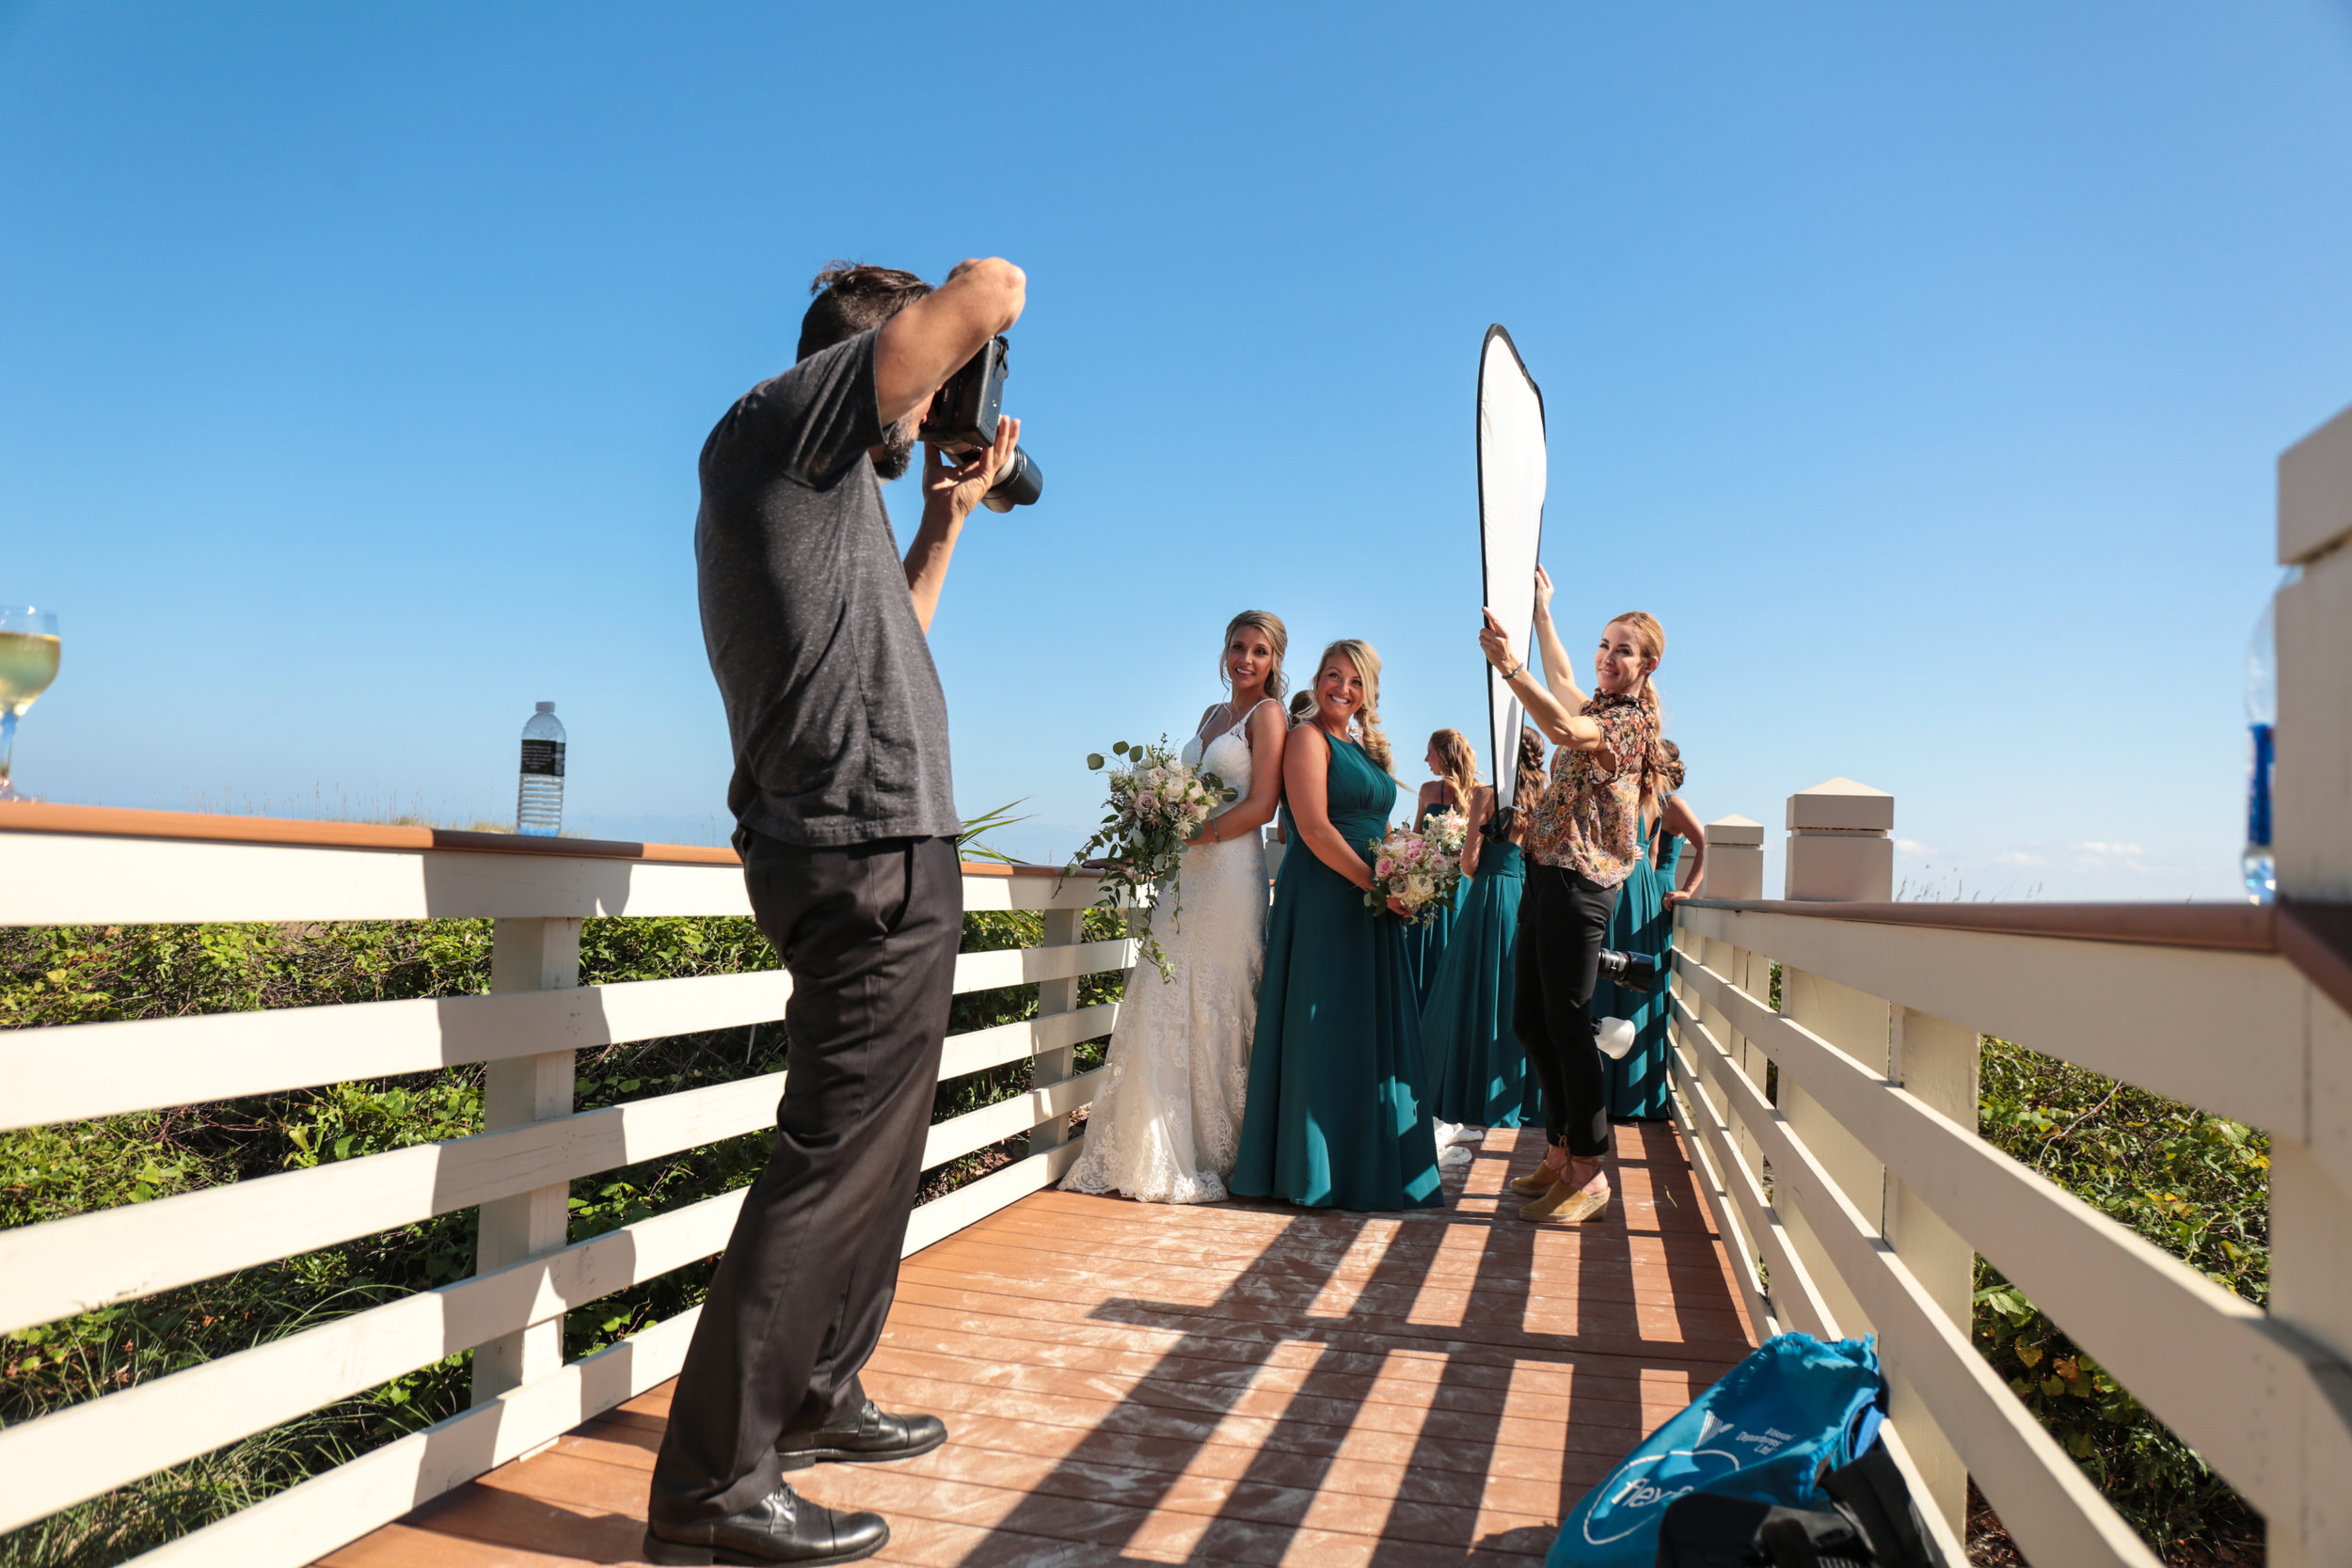 Wedding_Planning_Tips_Videographer_Charleston SC.jpg